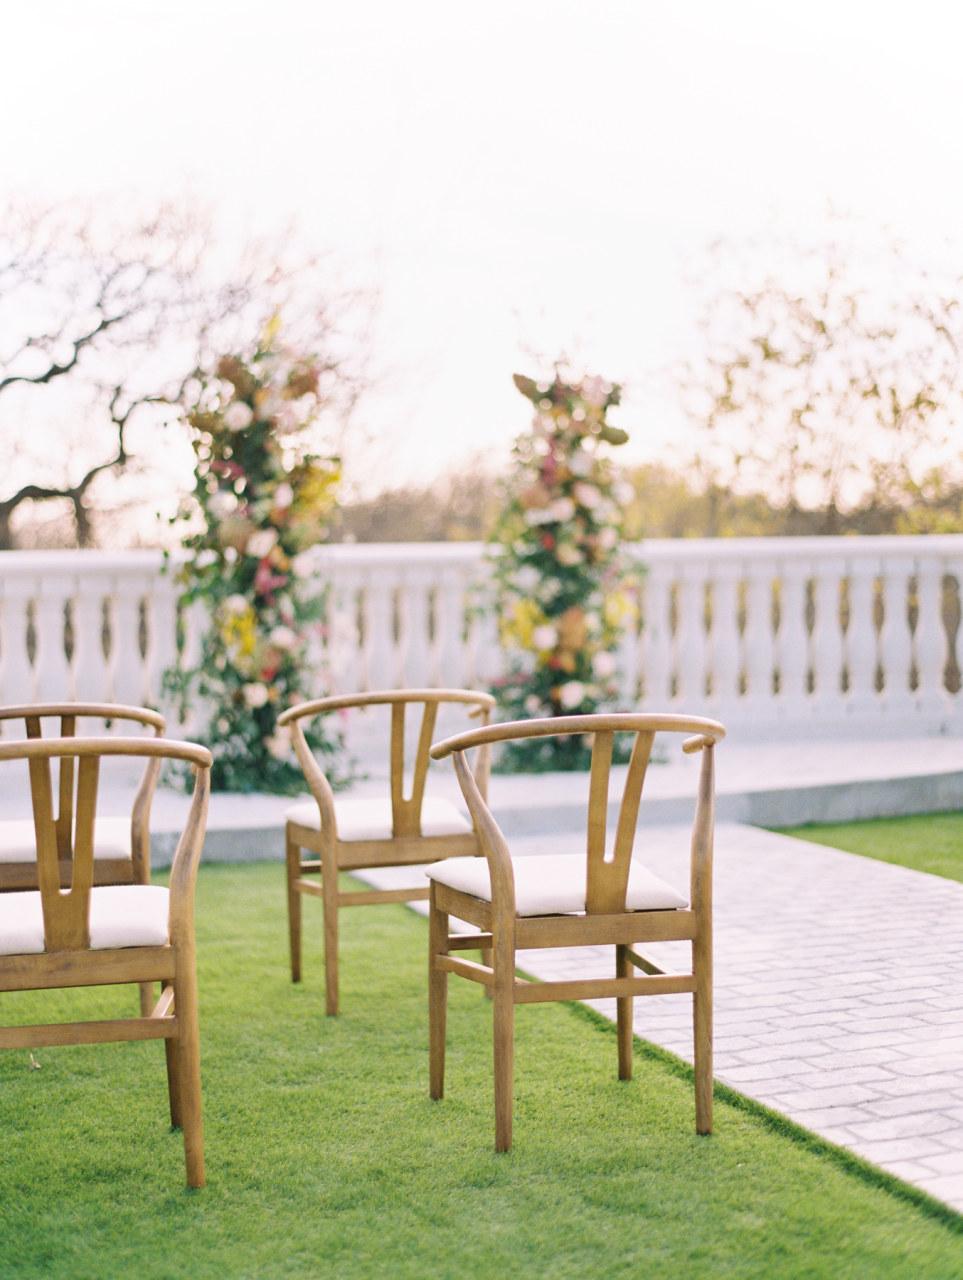 Hillside Estate Venue wedding ceremony inspiration